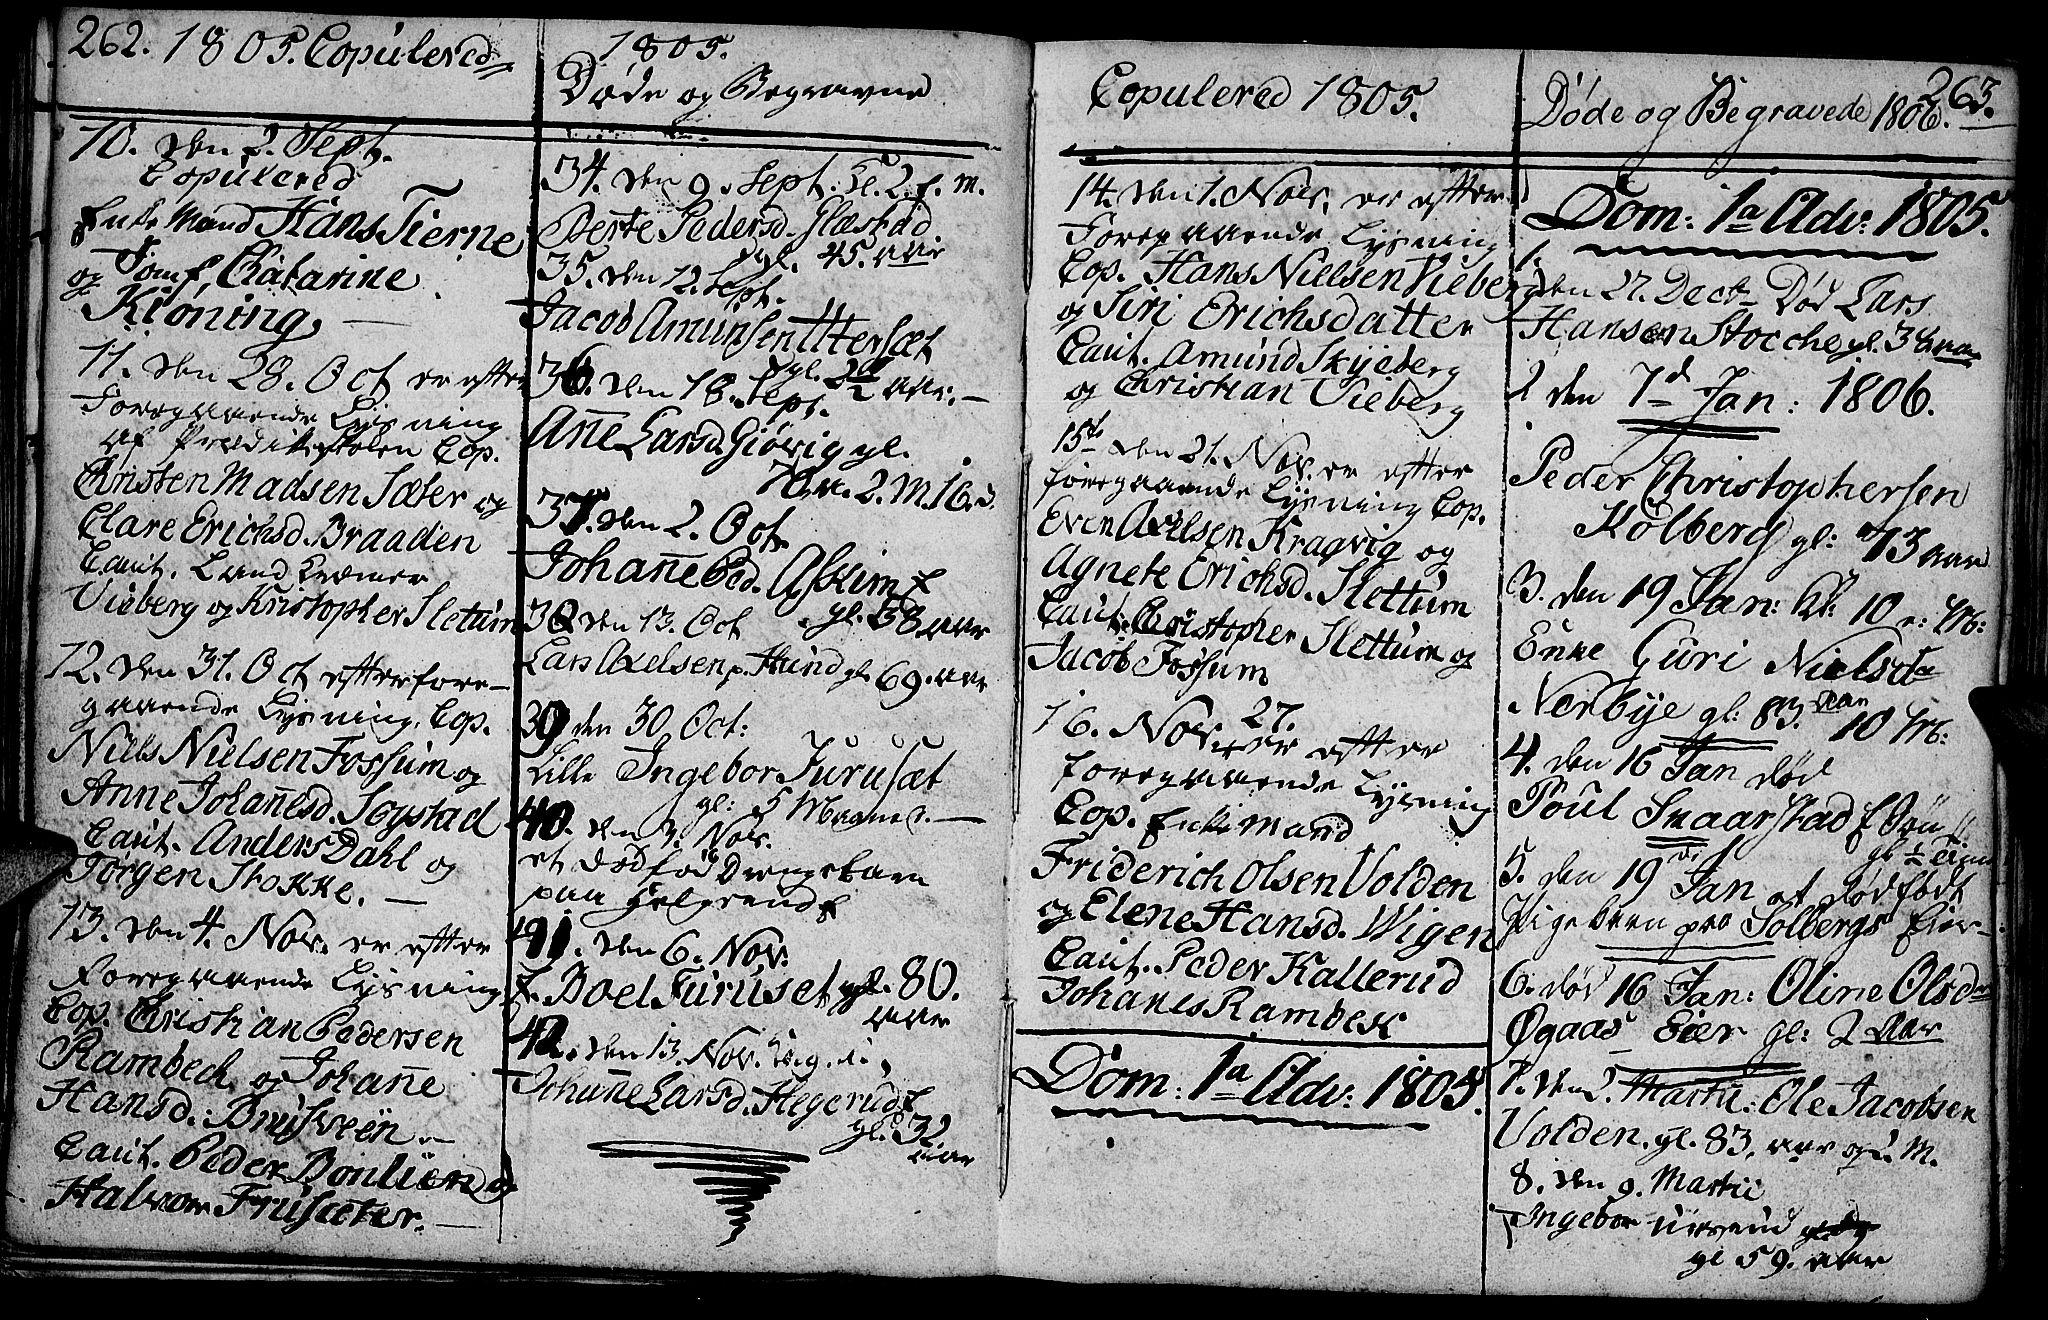 SAH, Vardal prestekontor, H/Ha/Hab/L0003: Klokkerbok nr. 3, 1803-1808, s. 262-263